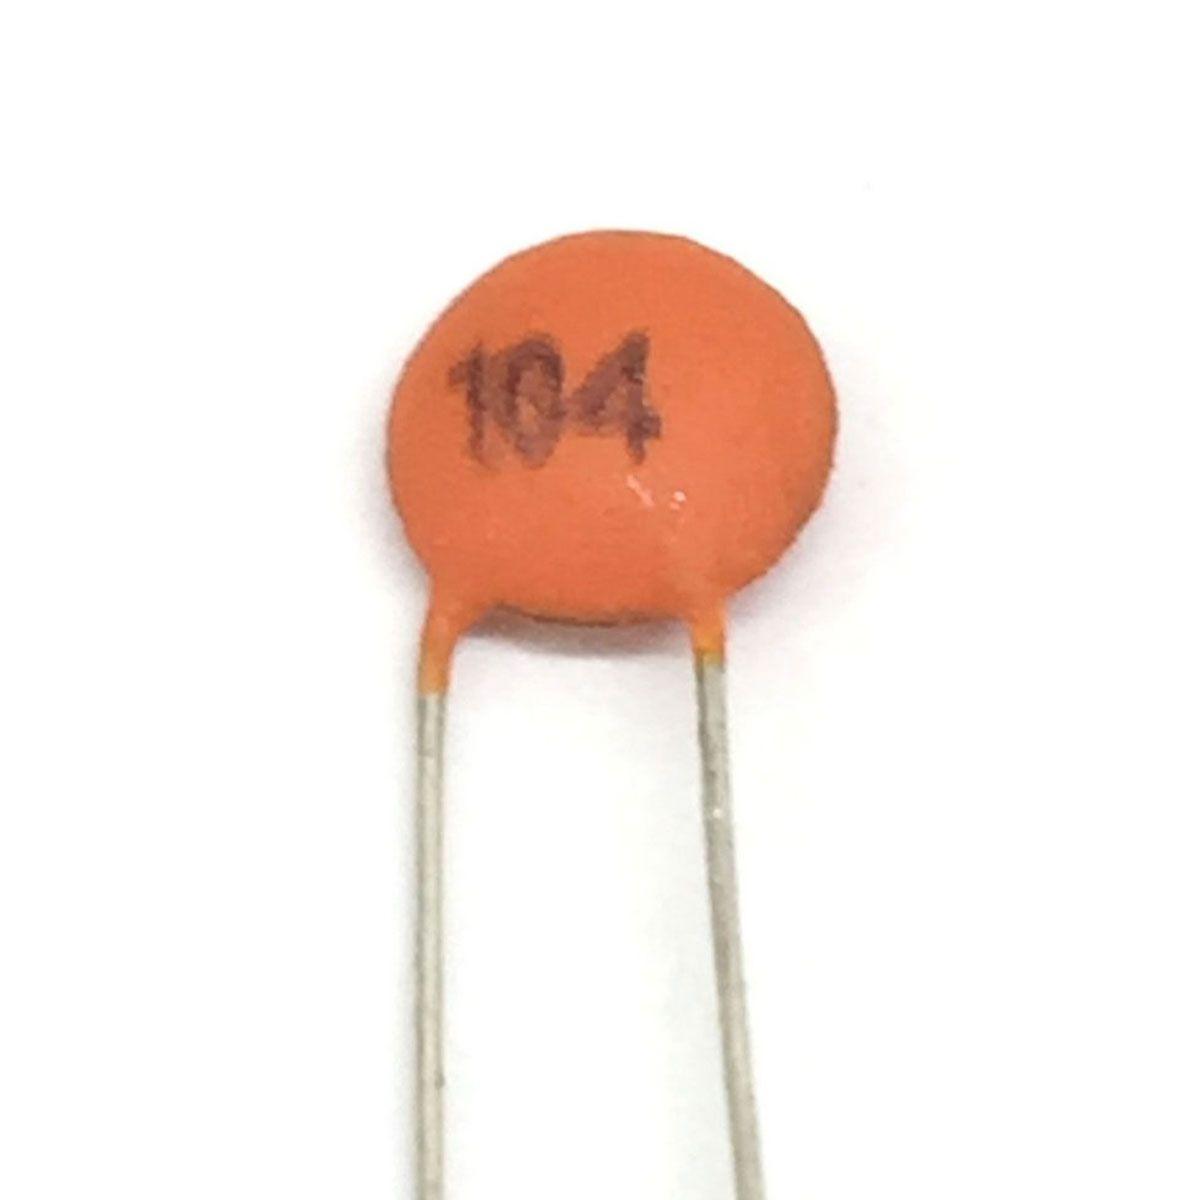 1000x Capacitor Cerämico / Cerâmica 104 100nF 50v (0,1uF/100K/100Kpf/104)